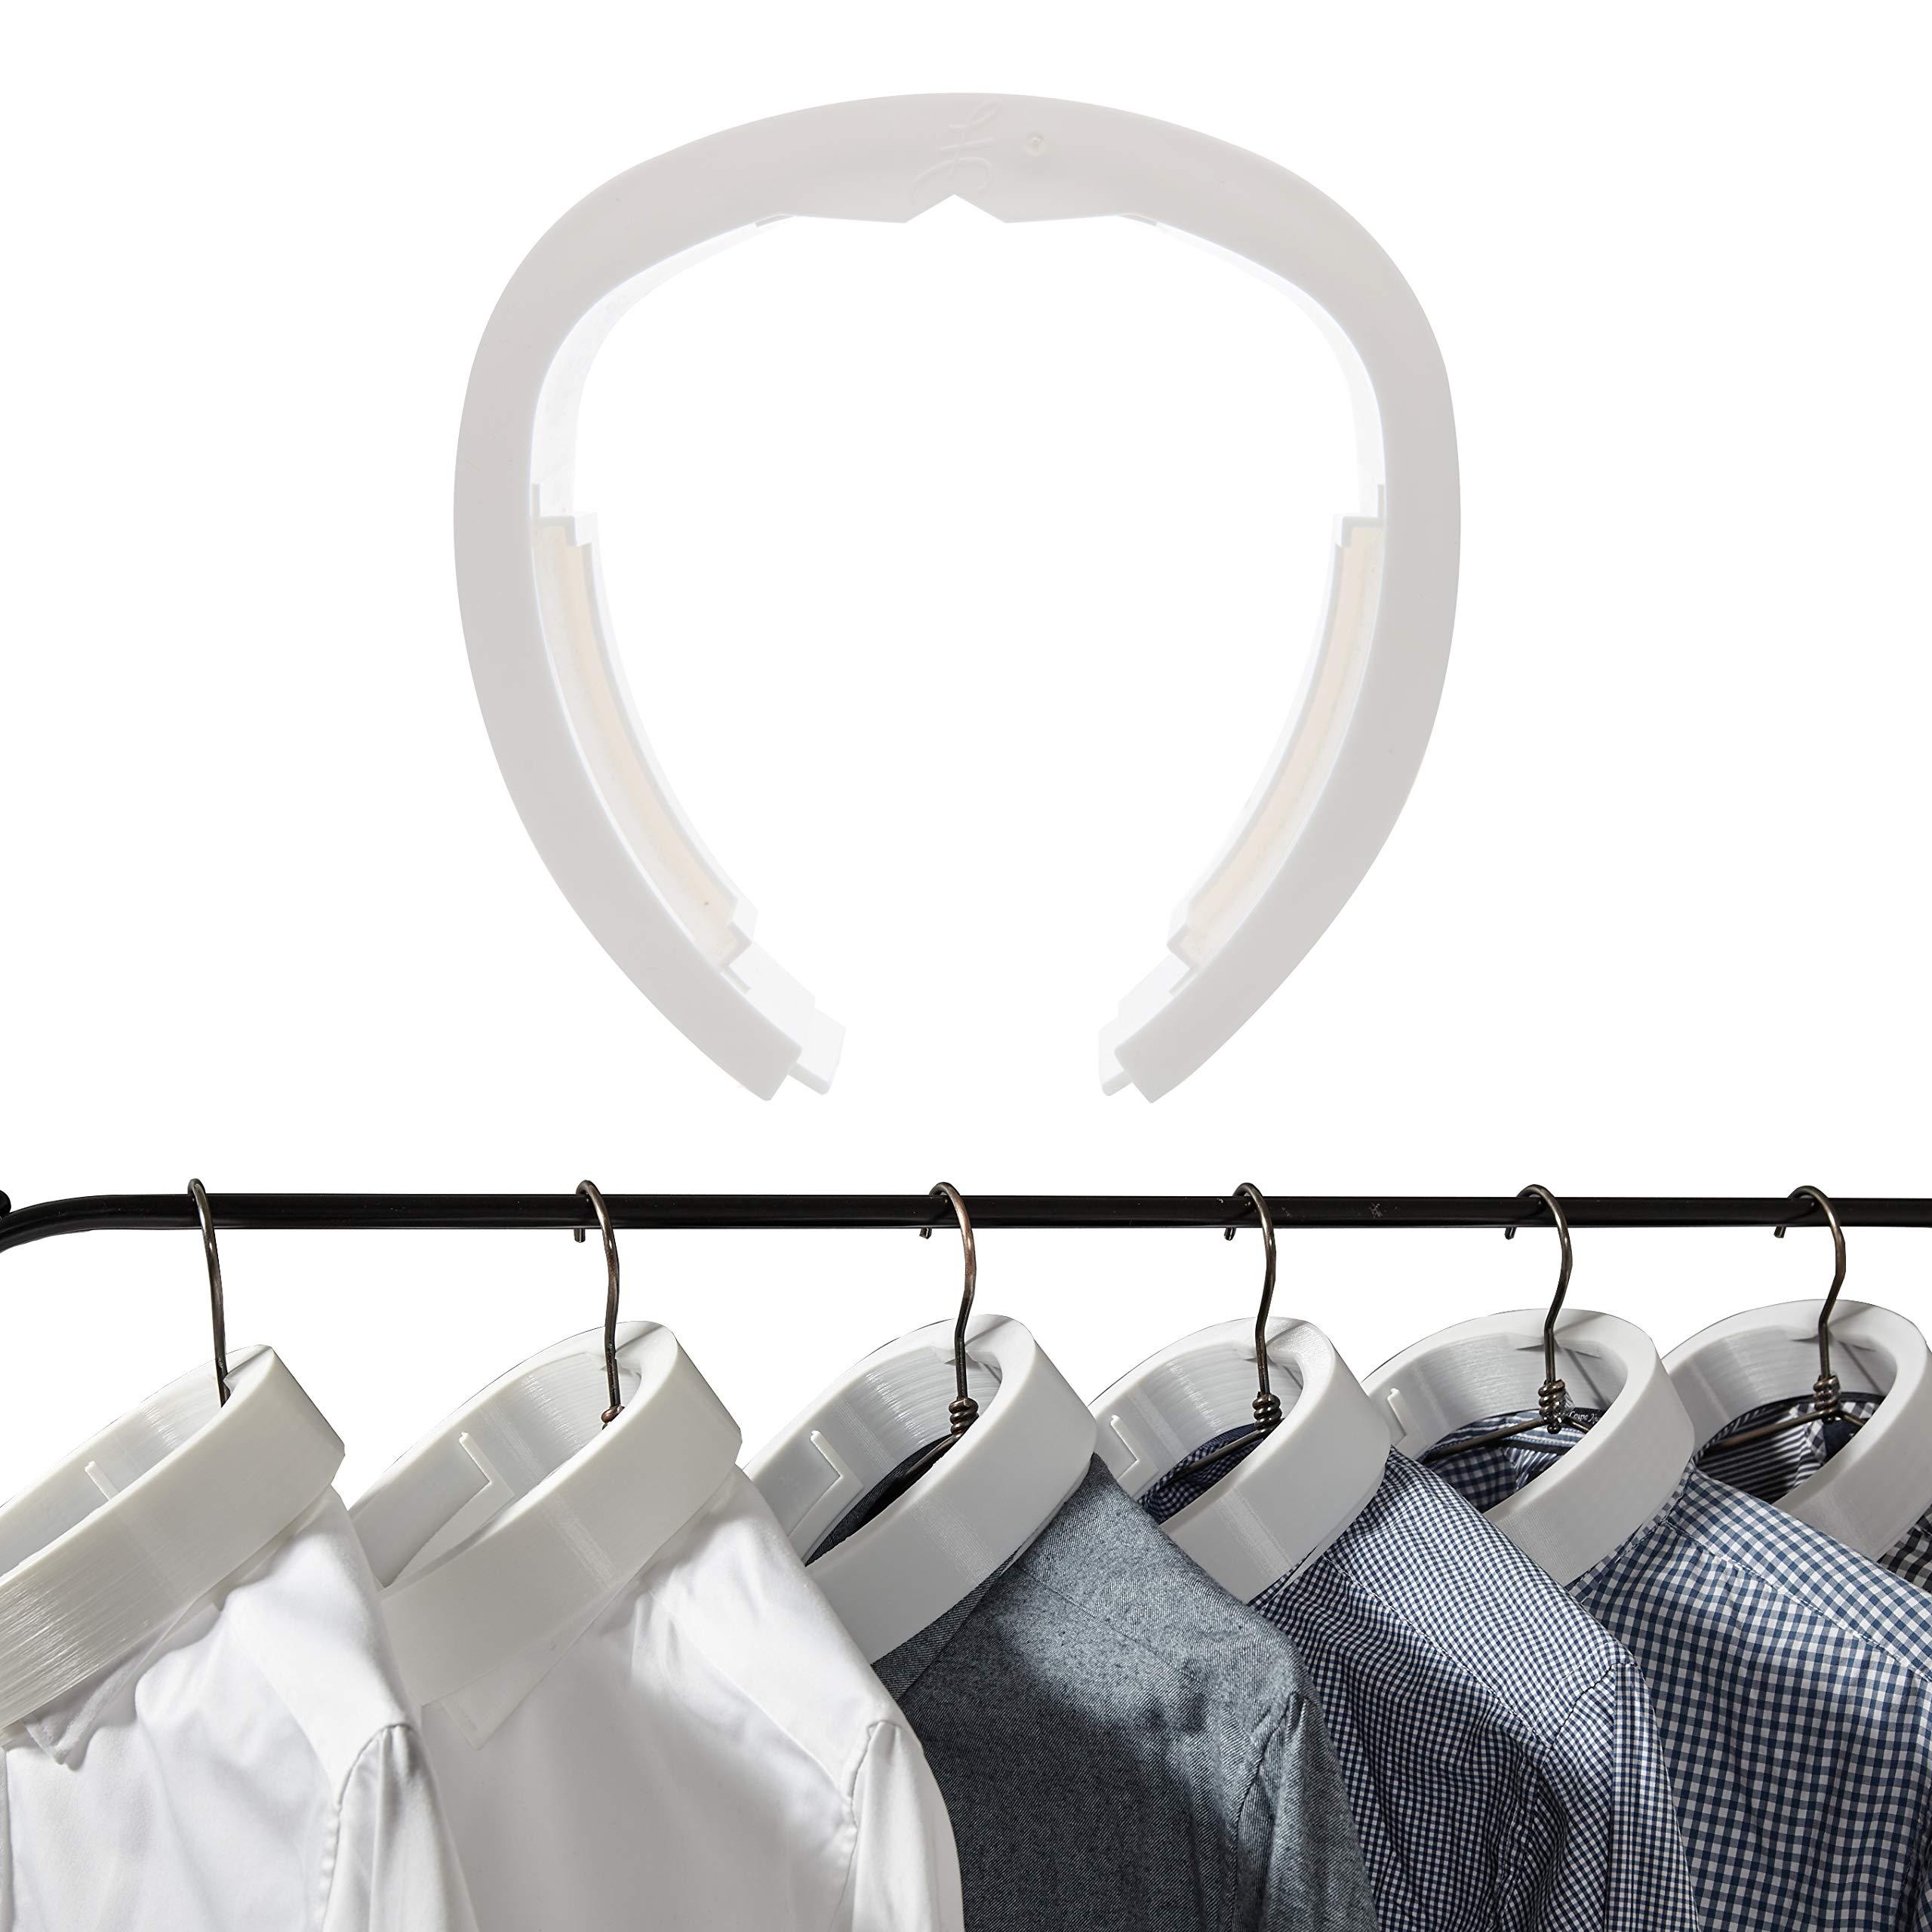 SI shirt collar stays natural collar stays collar stiff wrinkle free collarfit